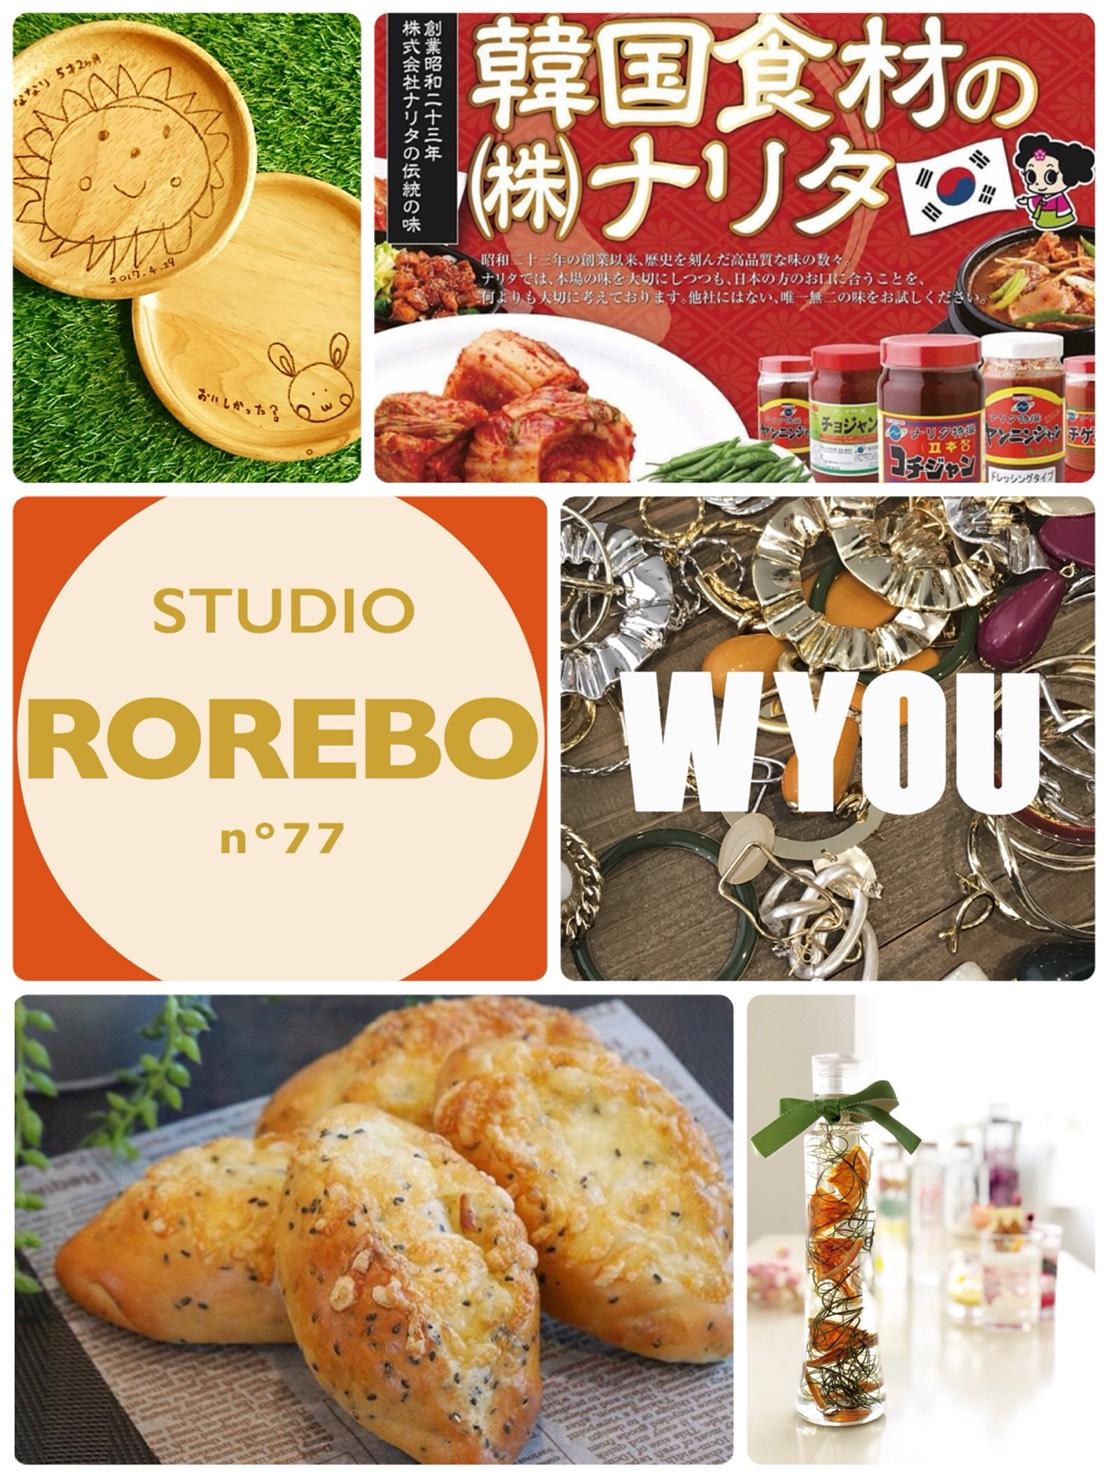 【STUDIO_ROREBO1周年感謝祭】に株式会社ナリタが出店致します!!!